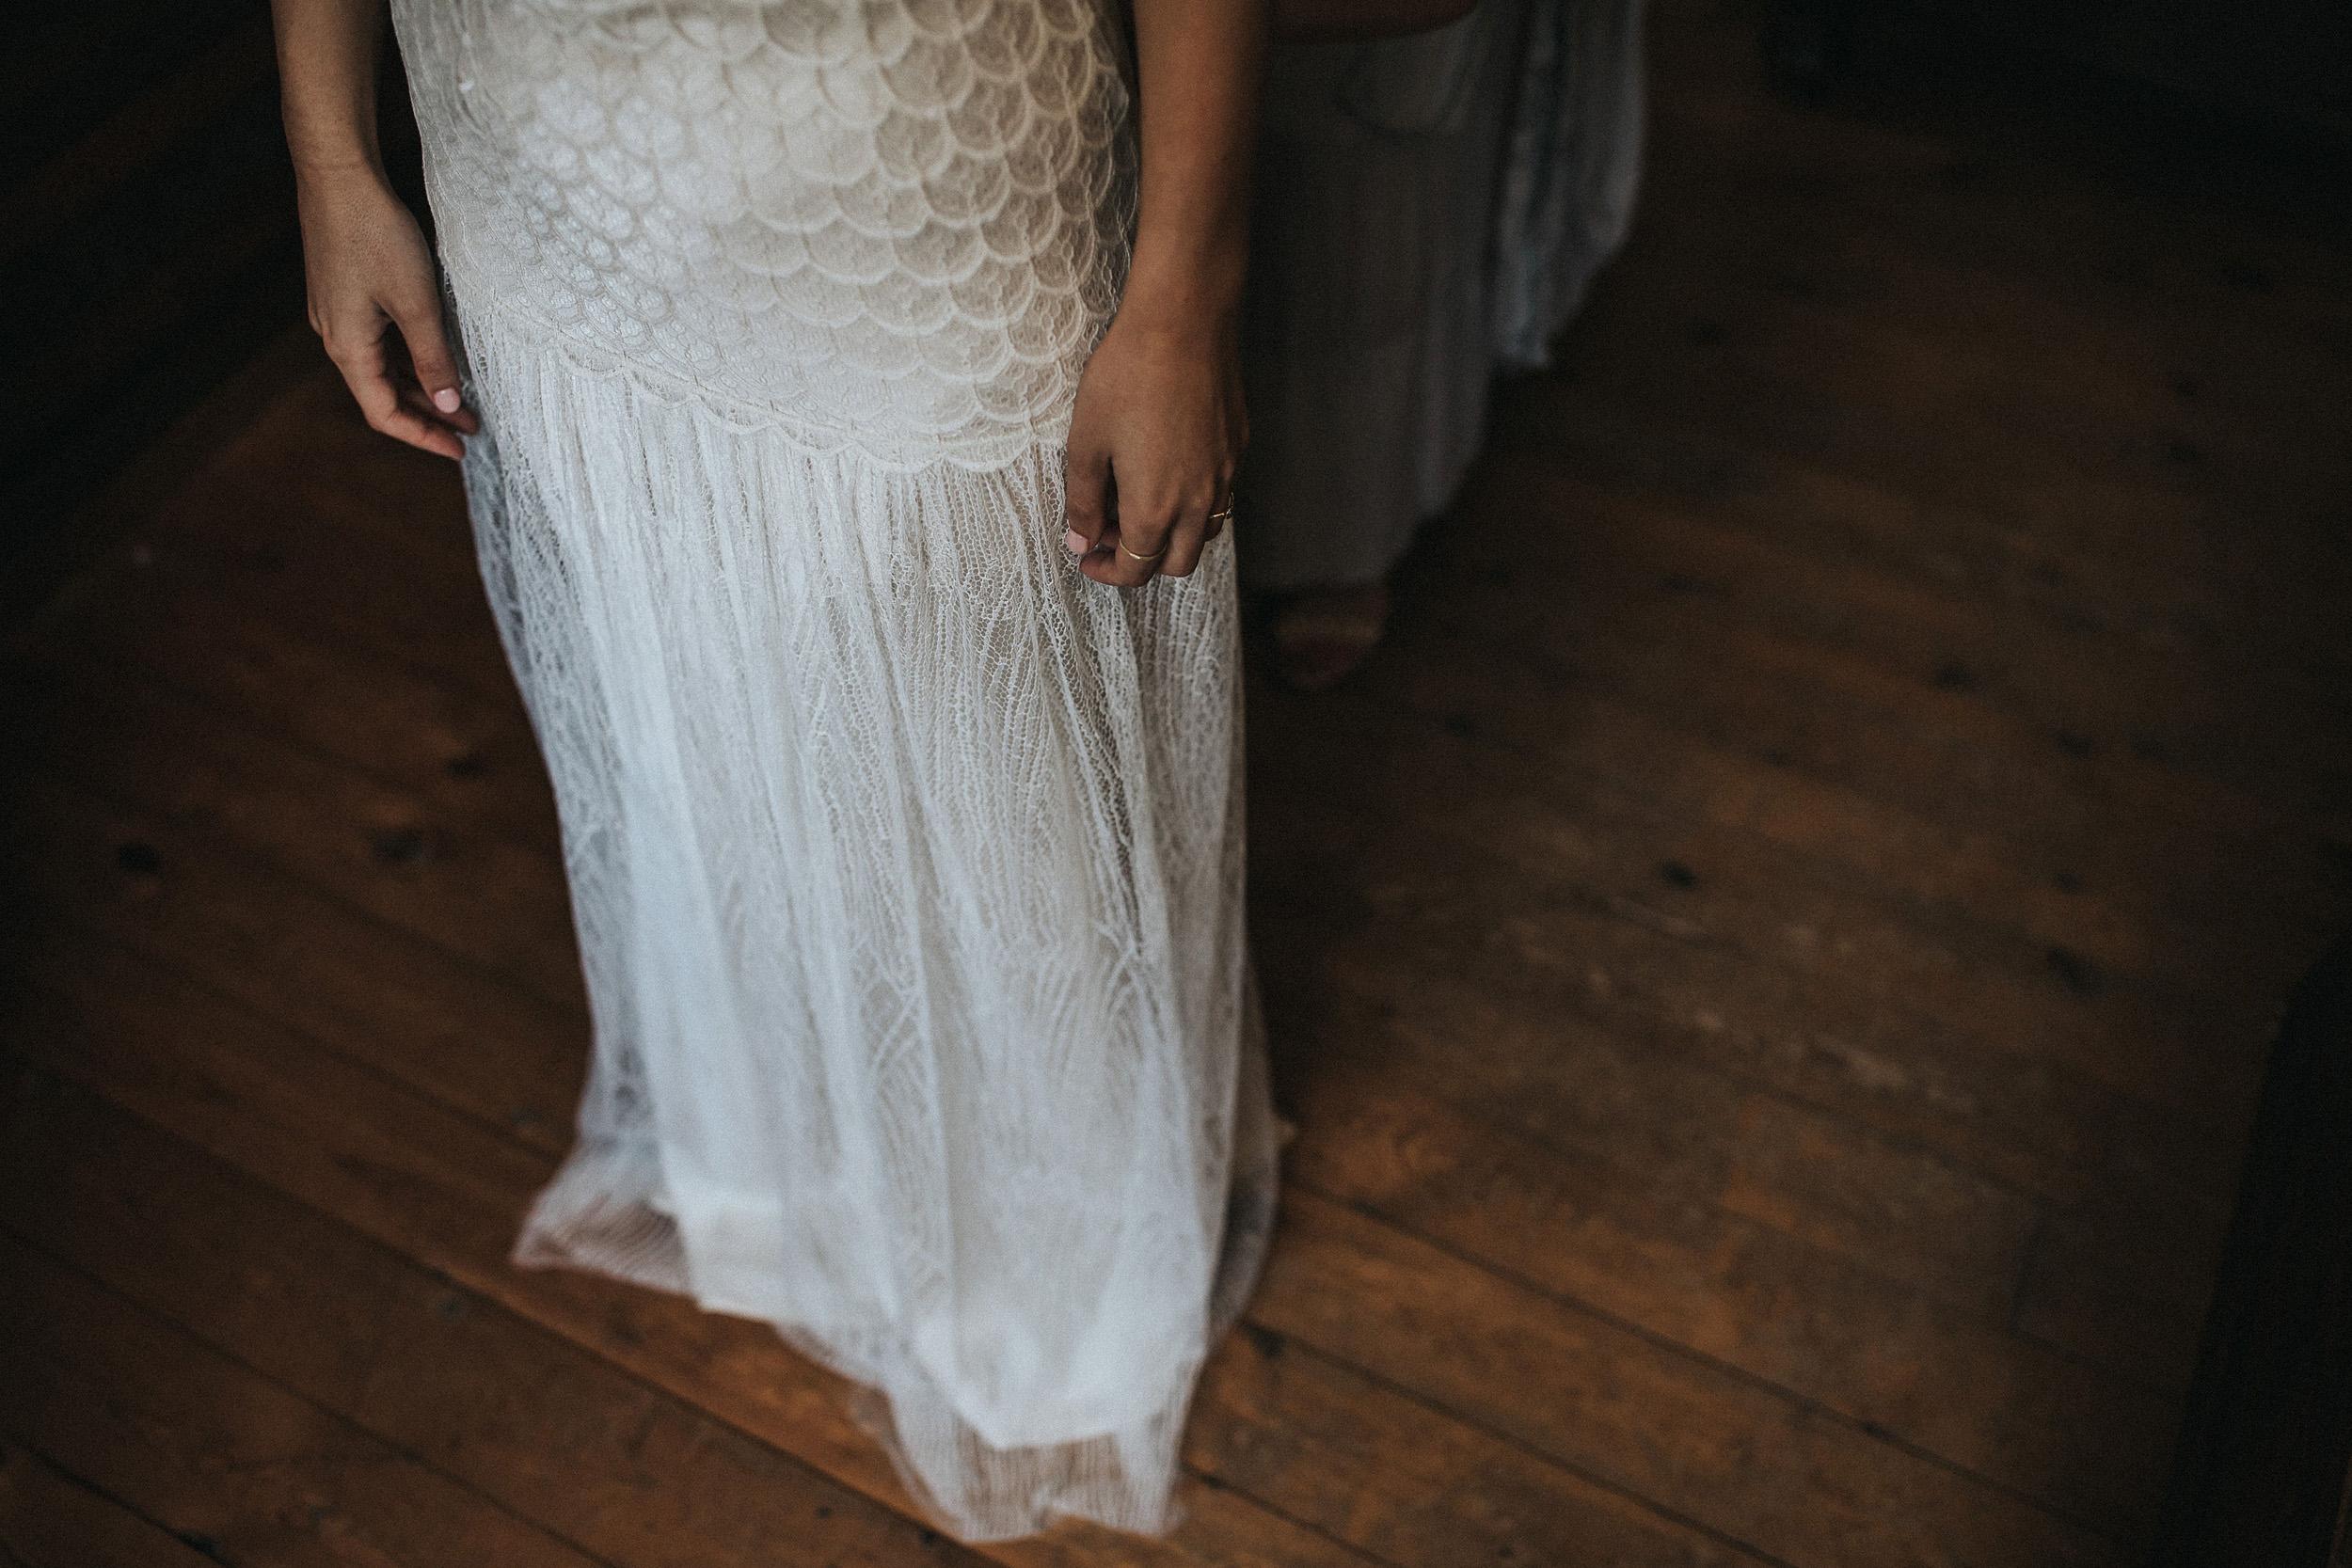 Martha-Laid-Back-Garden-Wedding-Lace-Wedding-Dress-Bohemian-Kate-Beaumont-3.jpg